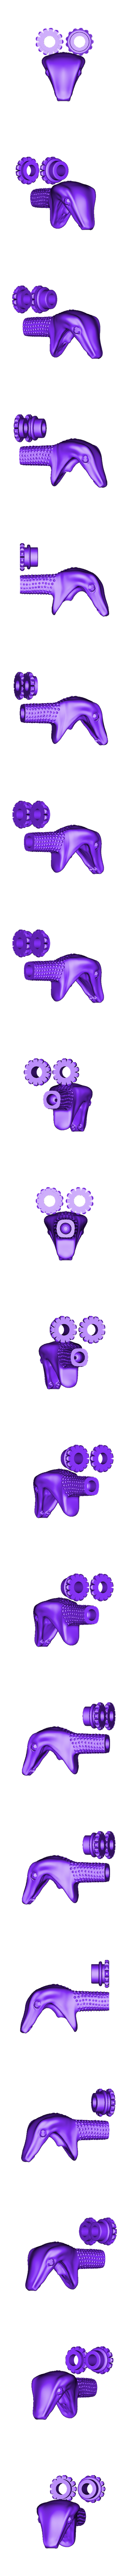 Pome.obj Download 3MF file Lucius Malfoy Sale Wand • Model to 3D print, santuli700